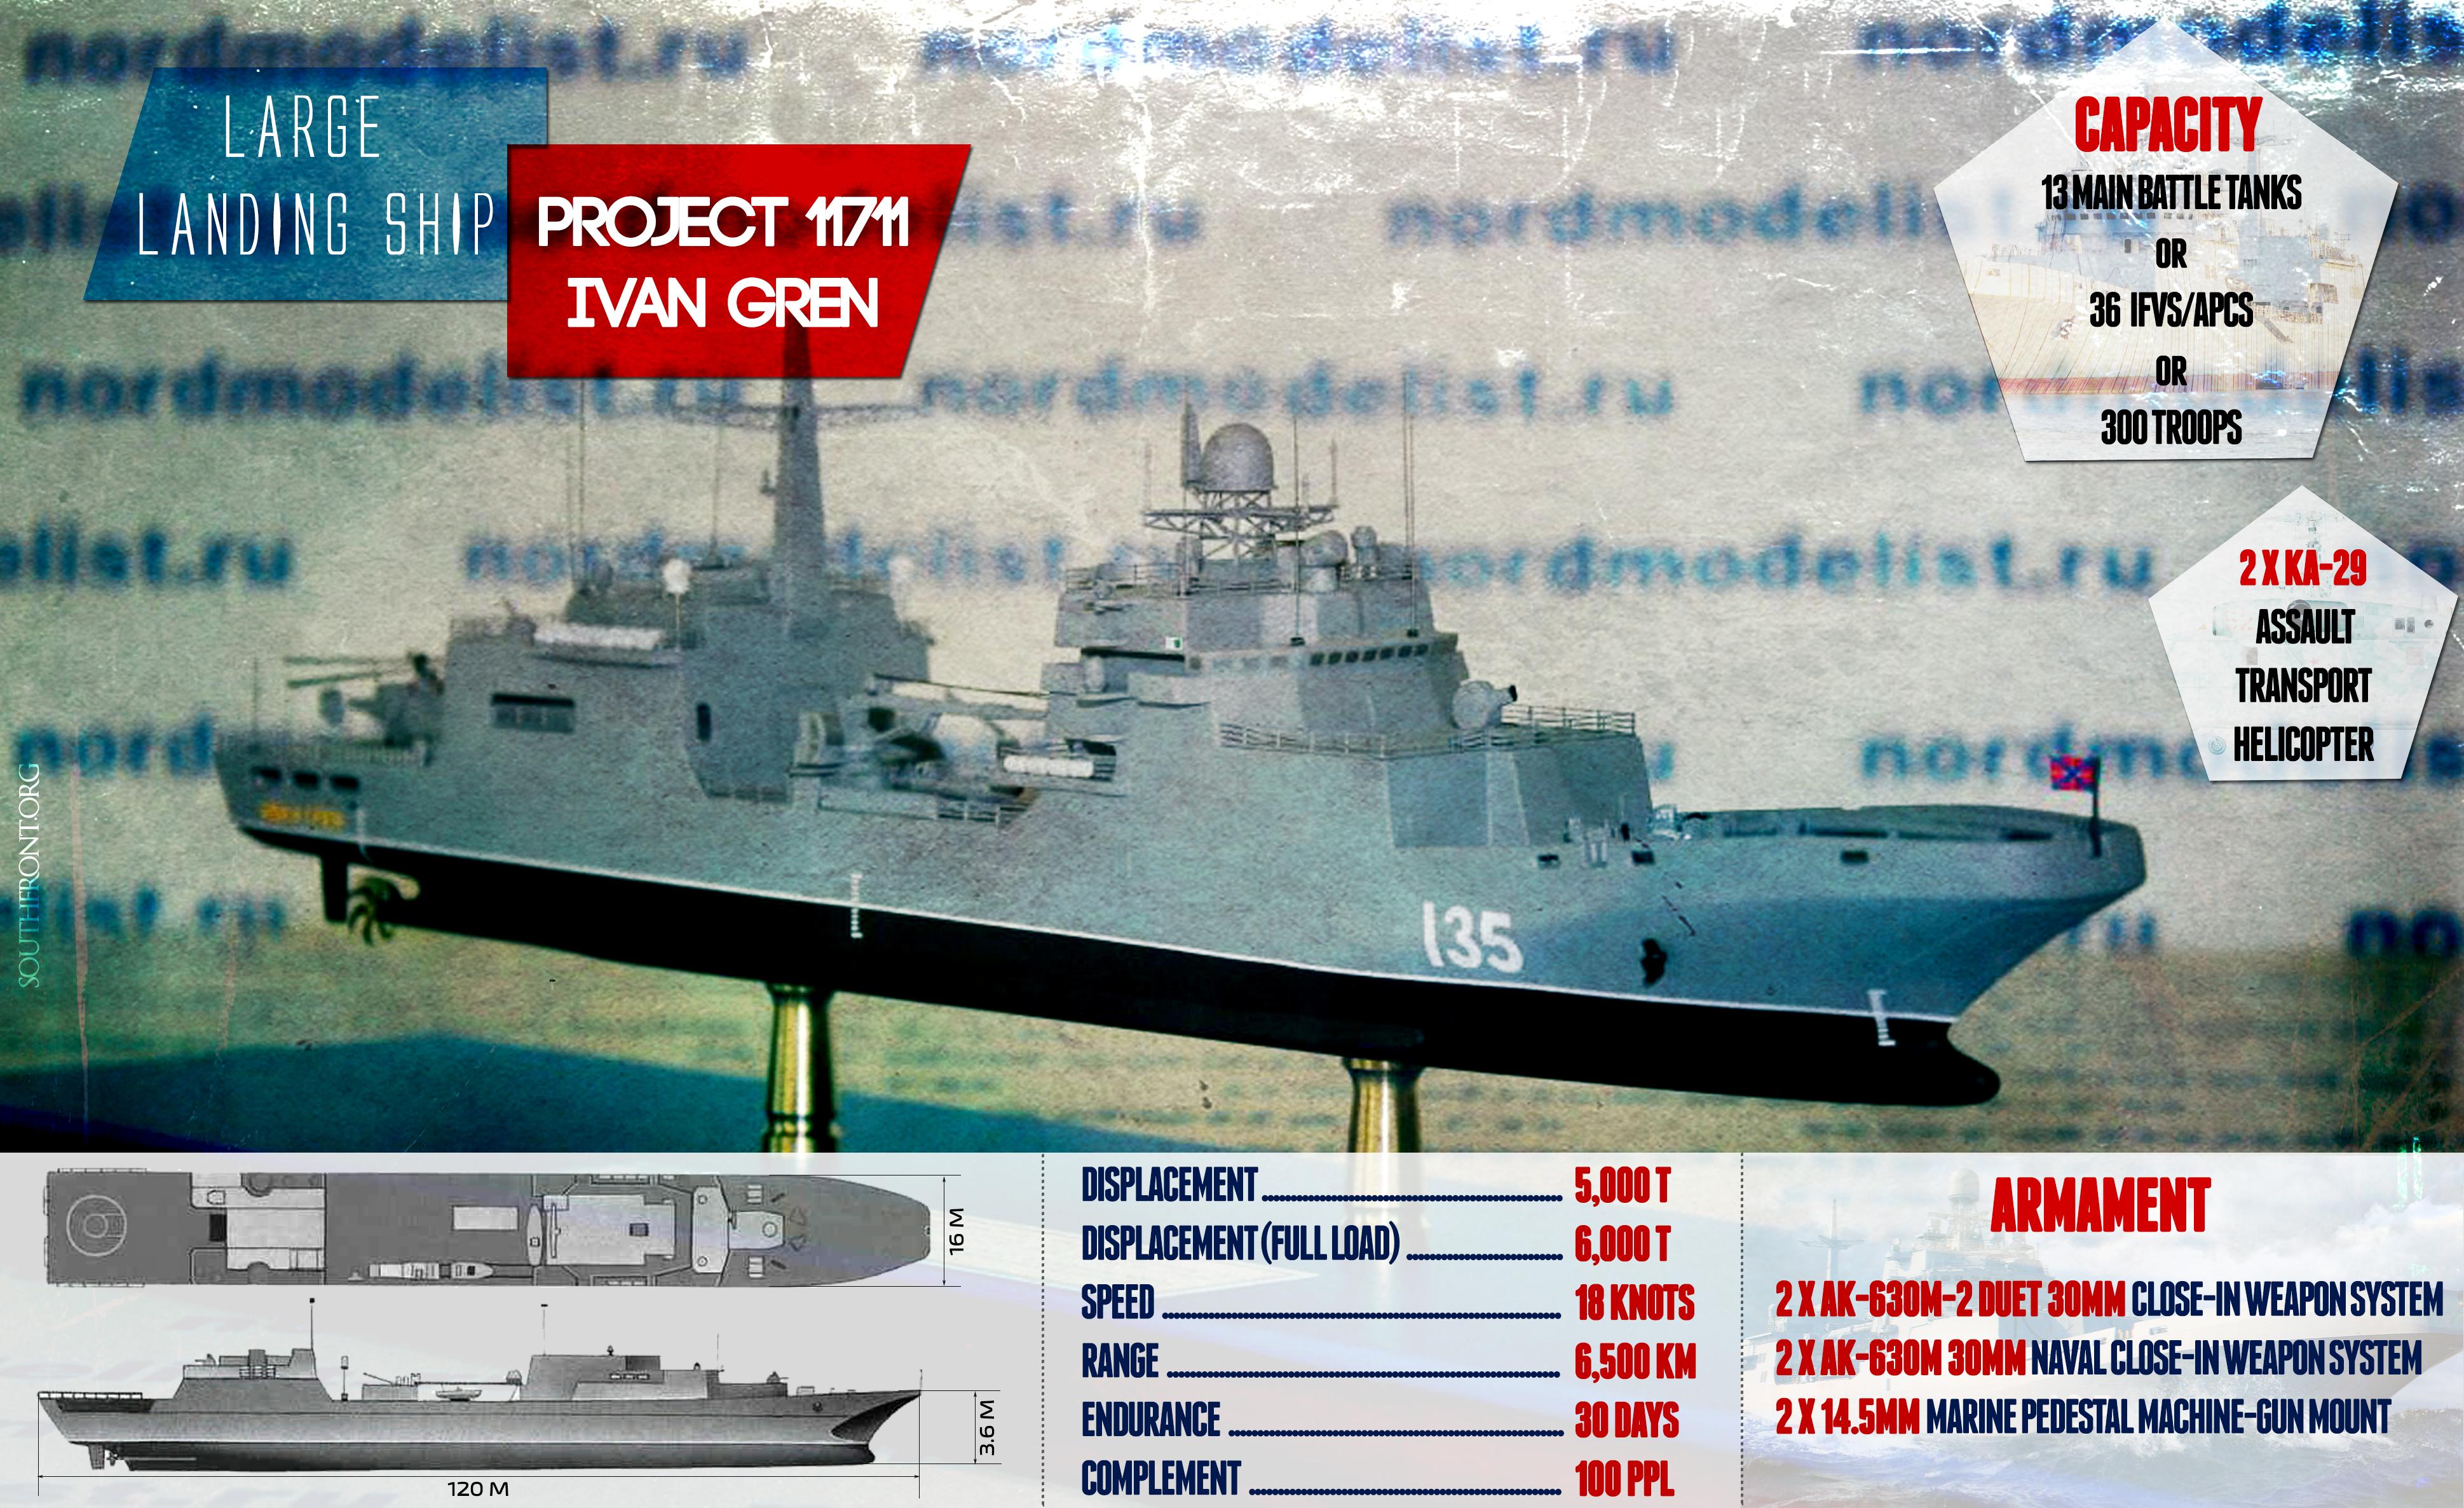 Large Landing Ship Ivan Gren (Infographics)